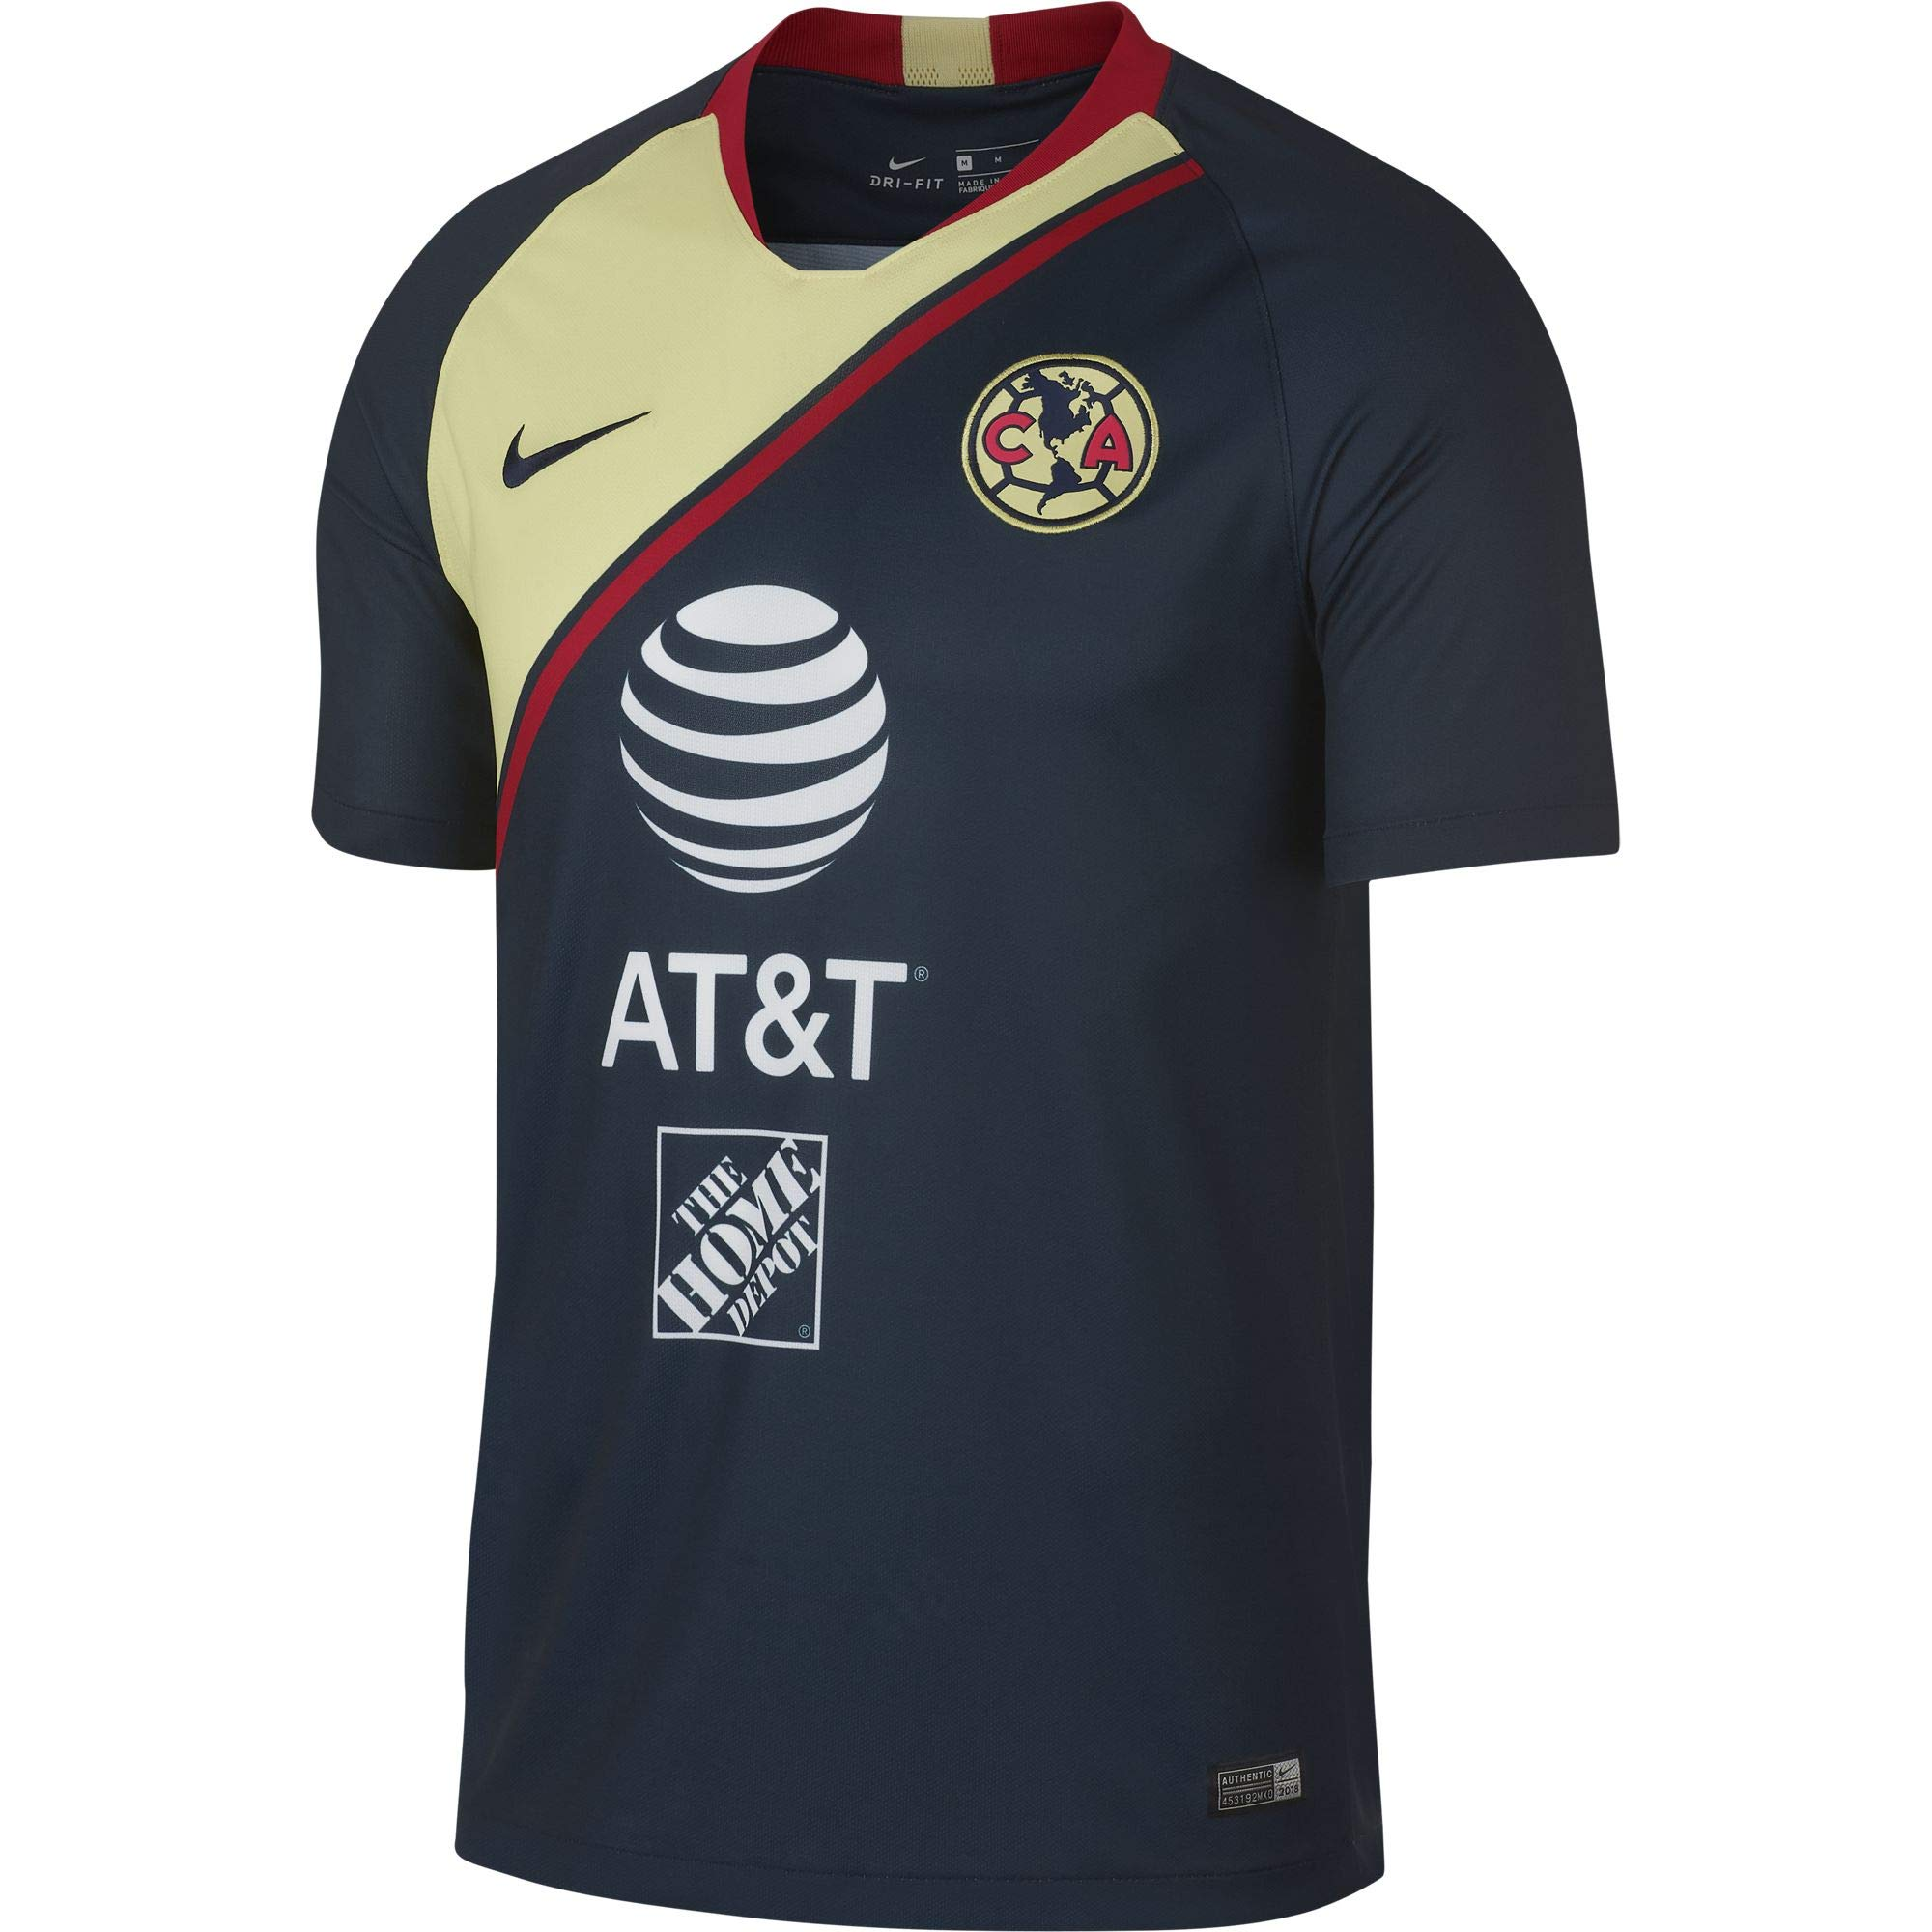 8fa24c89753 NIKE Club America Away Stadium Soccer Jersey 2018 19 product image